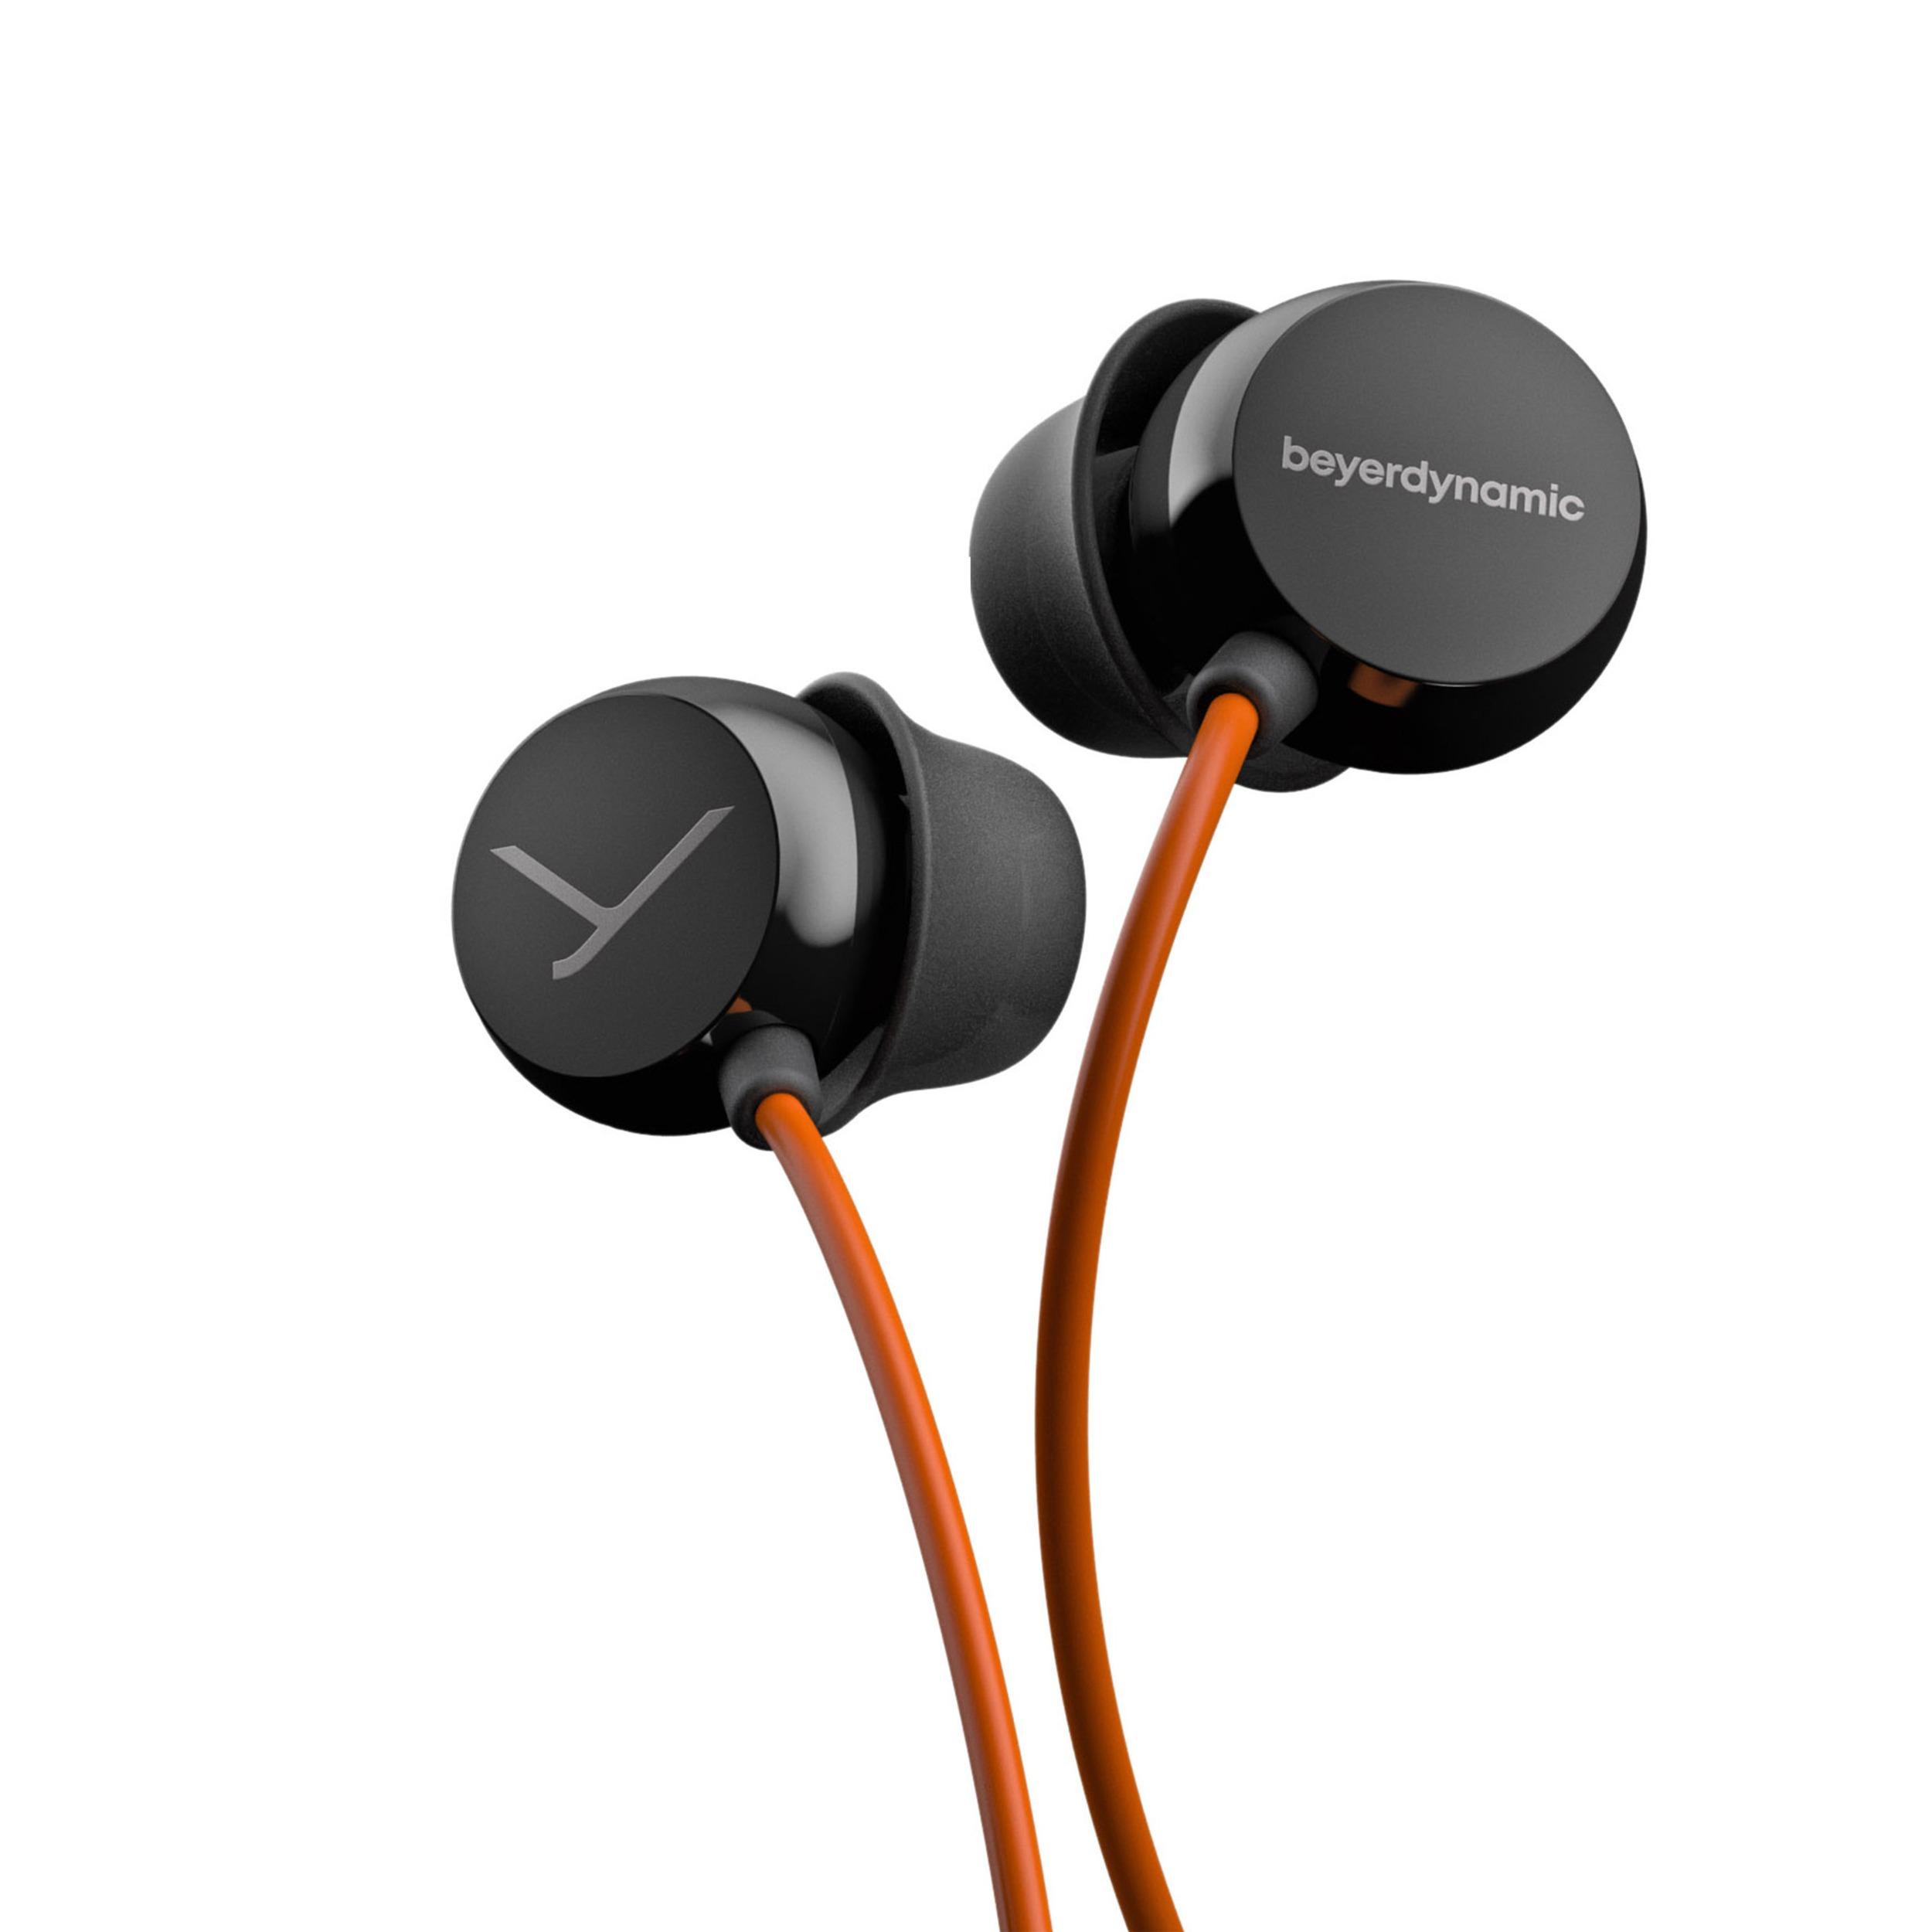 d05c7bd7d2c beyerdynamic iDX 200 iE: Top-quality sound for your smartphone